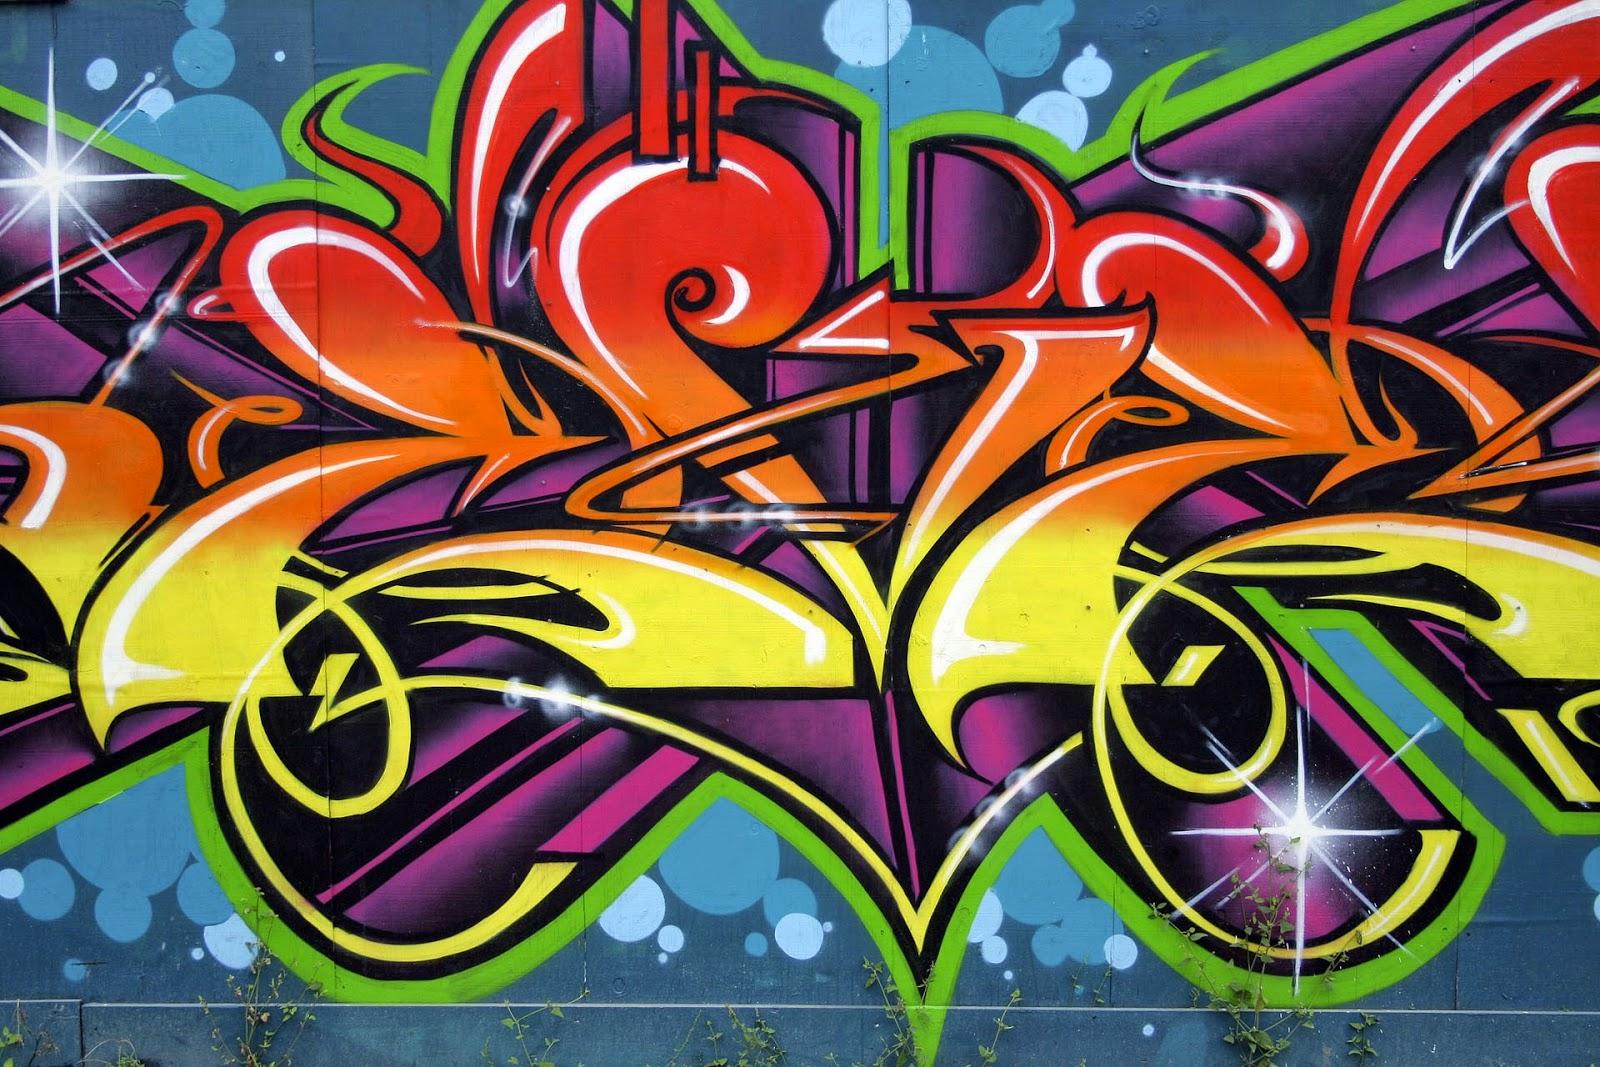 Pin The Colorful Graffiti Wallpaper Hd Free For Desktop